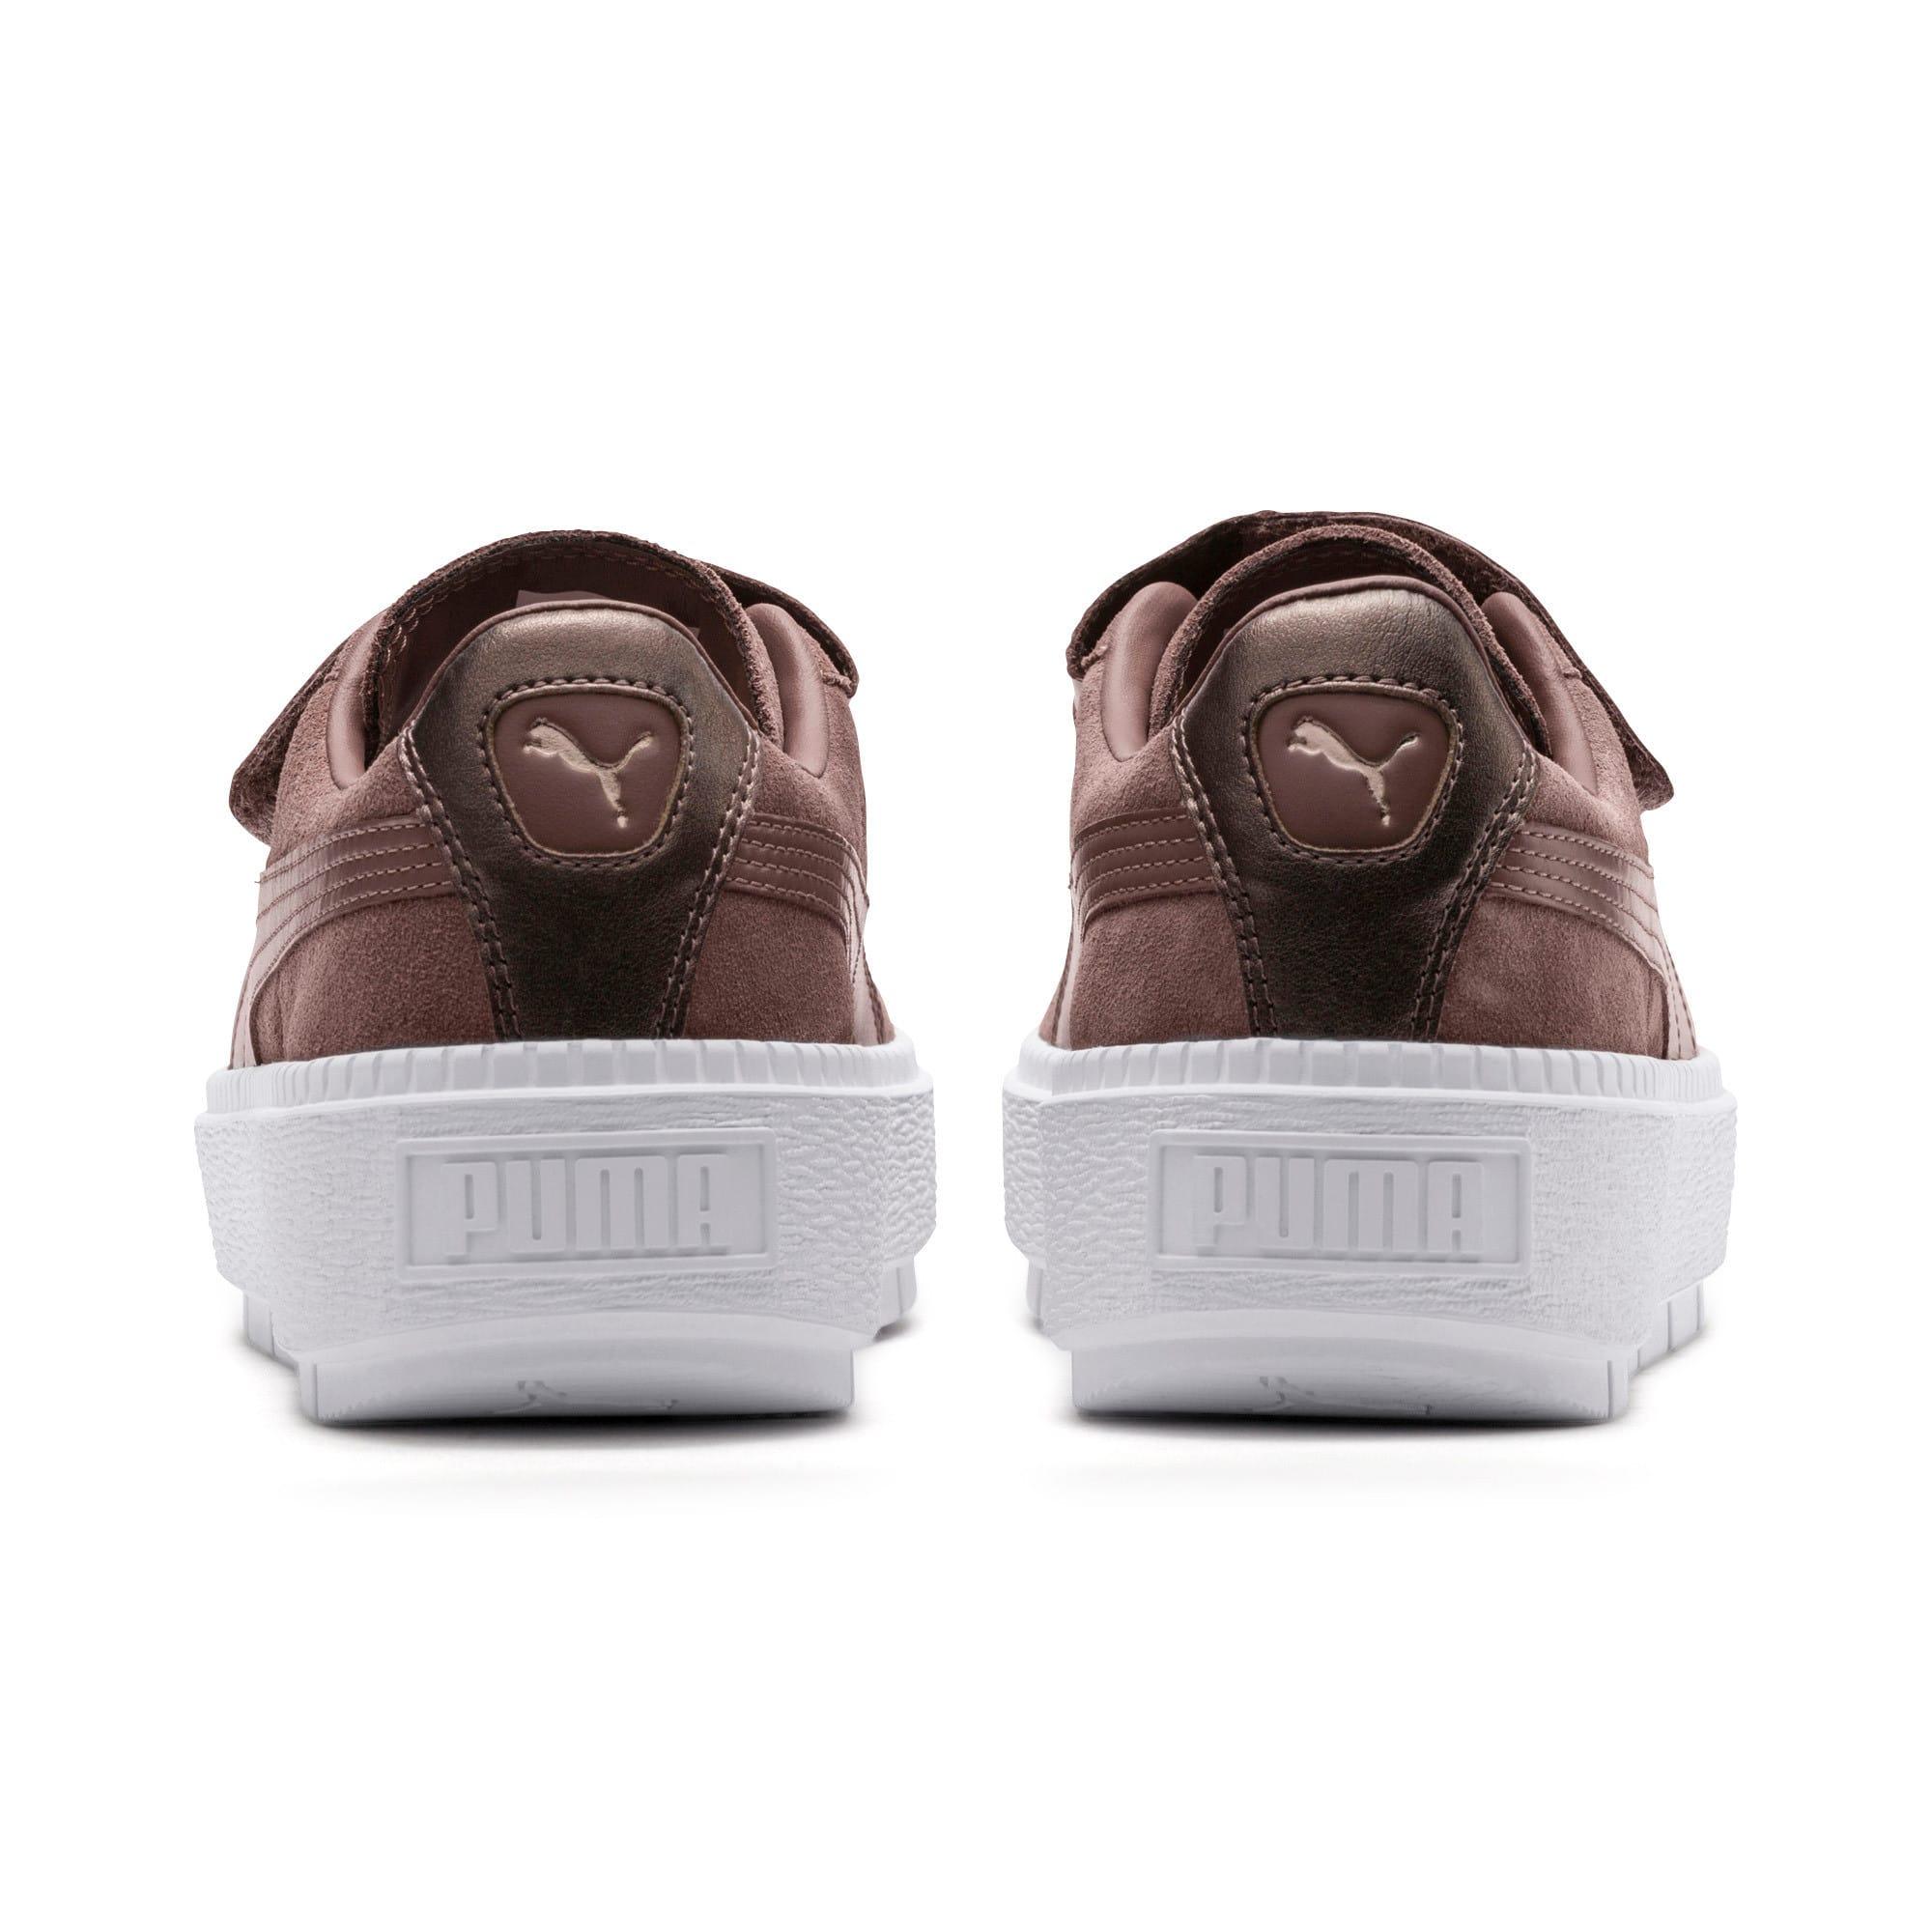 Thumbnail 4 of Platform Trace Strap Esc Women's Sneakers, Peppercorn-Peppercorn, medium